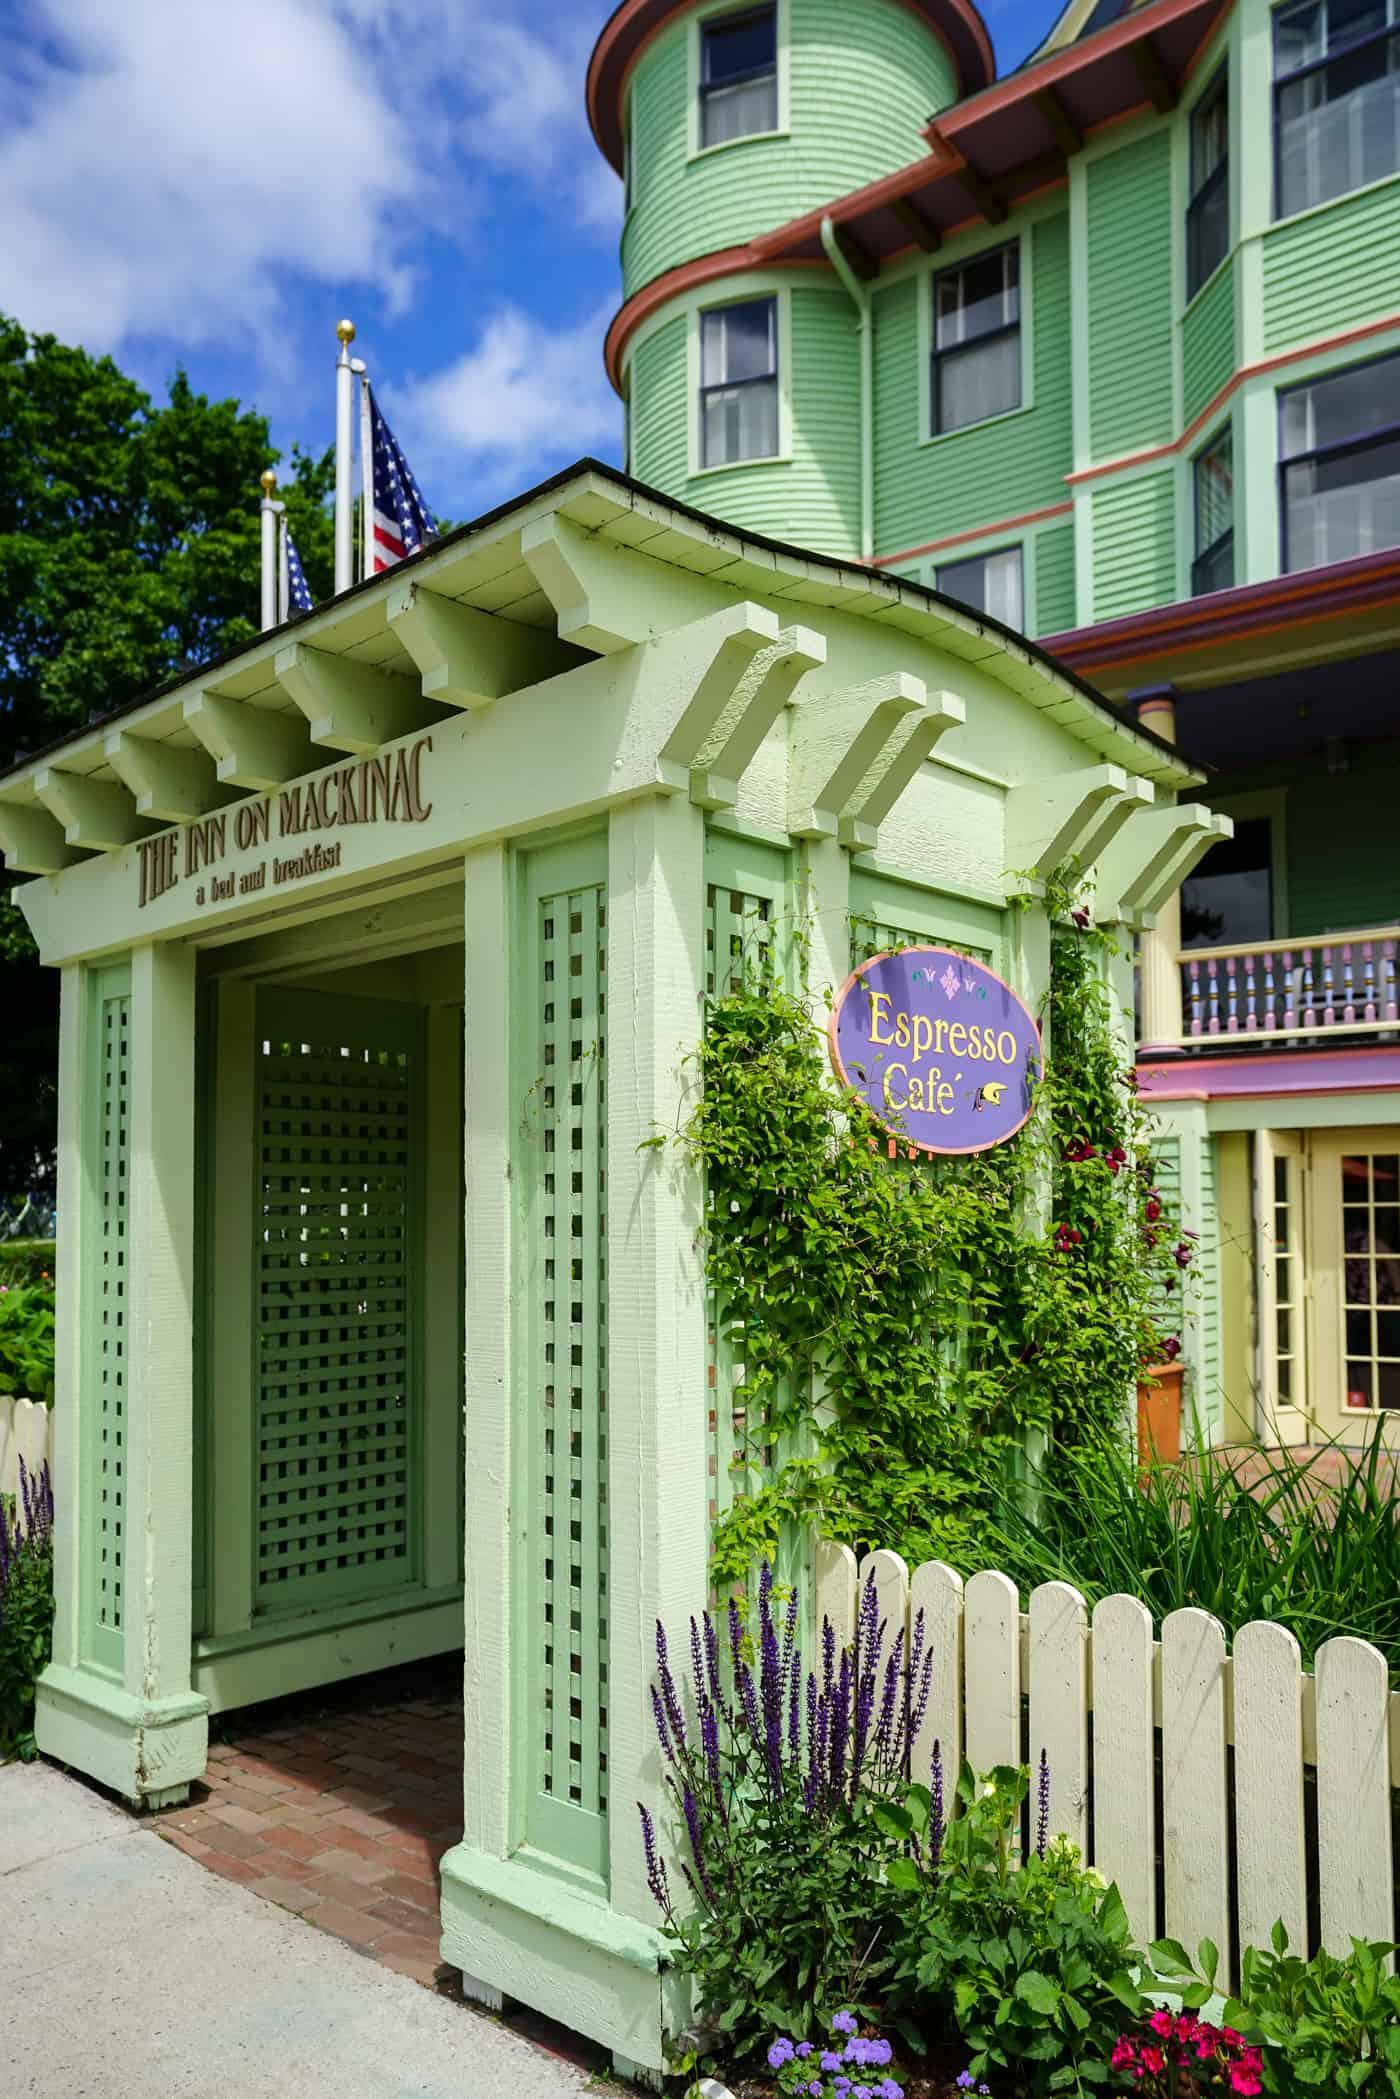 Front gate of the Inn on Mackinac on Mackinac Island